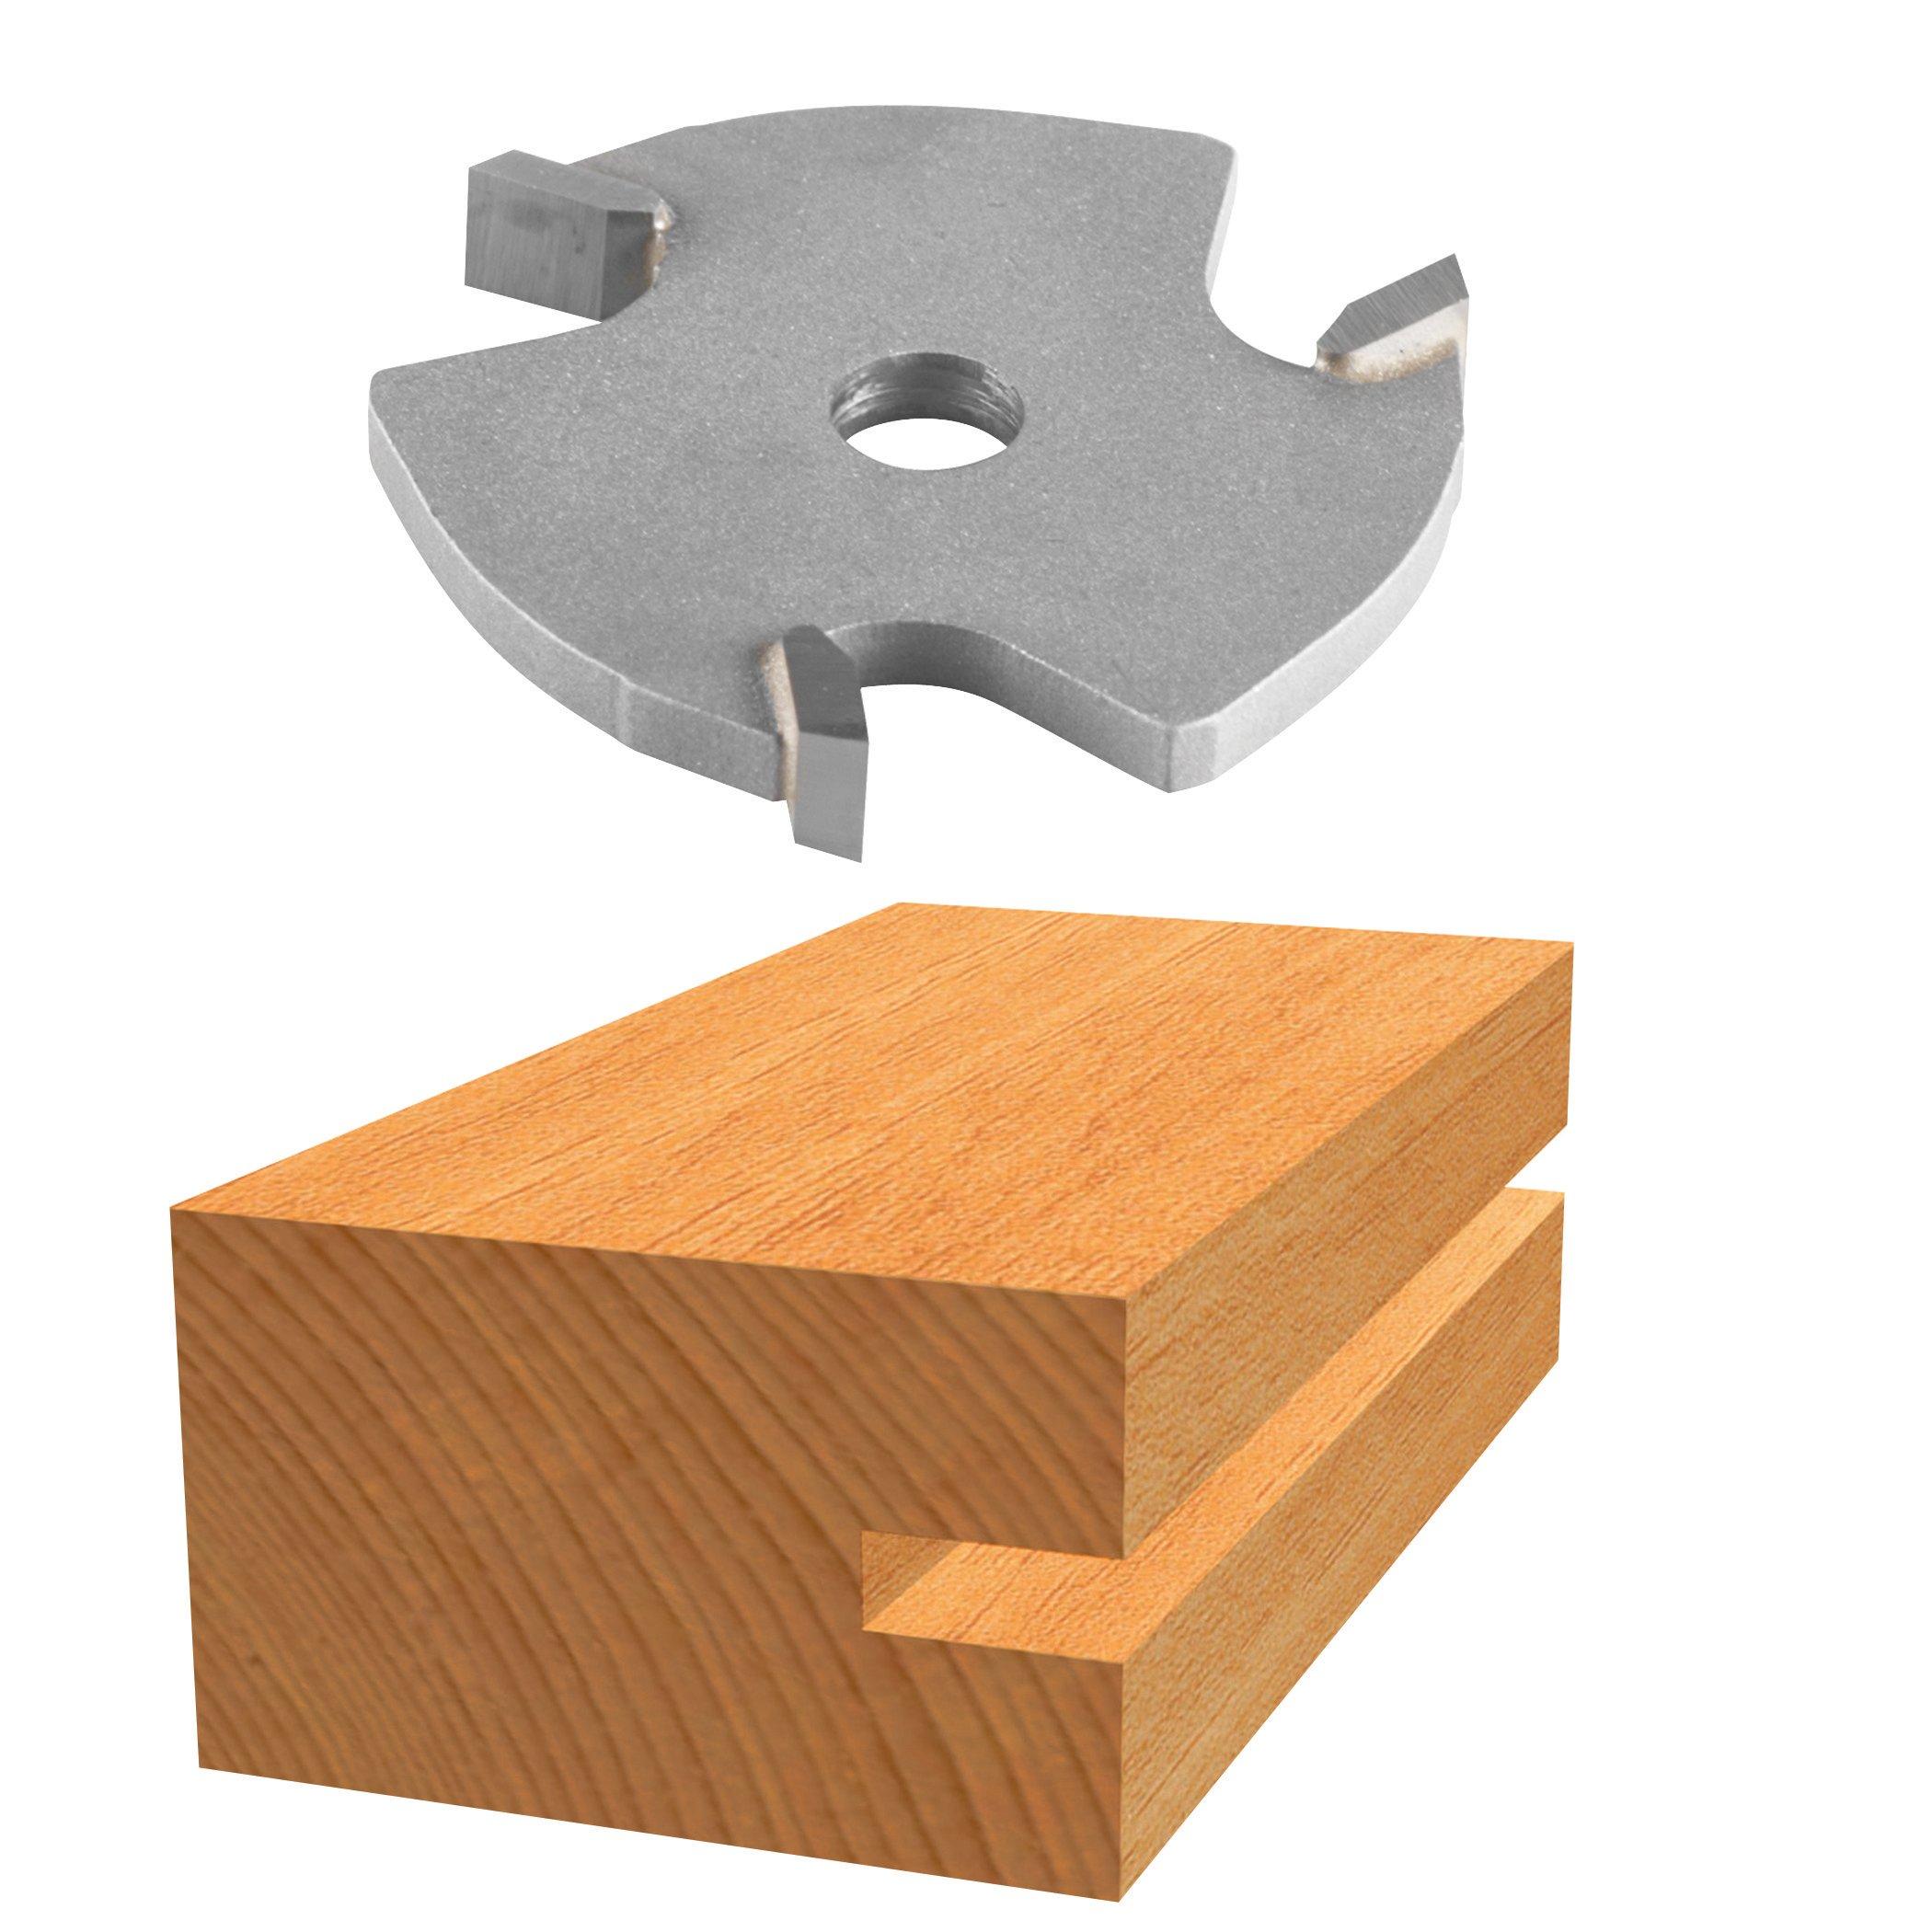 Bosch 85609M 3/16 In. Carbide Tipped 3-Wing Slotting Cutter Bit